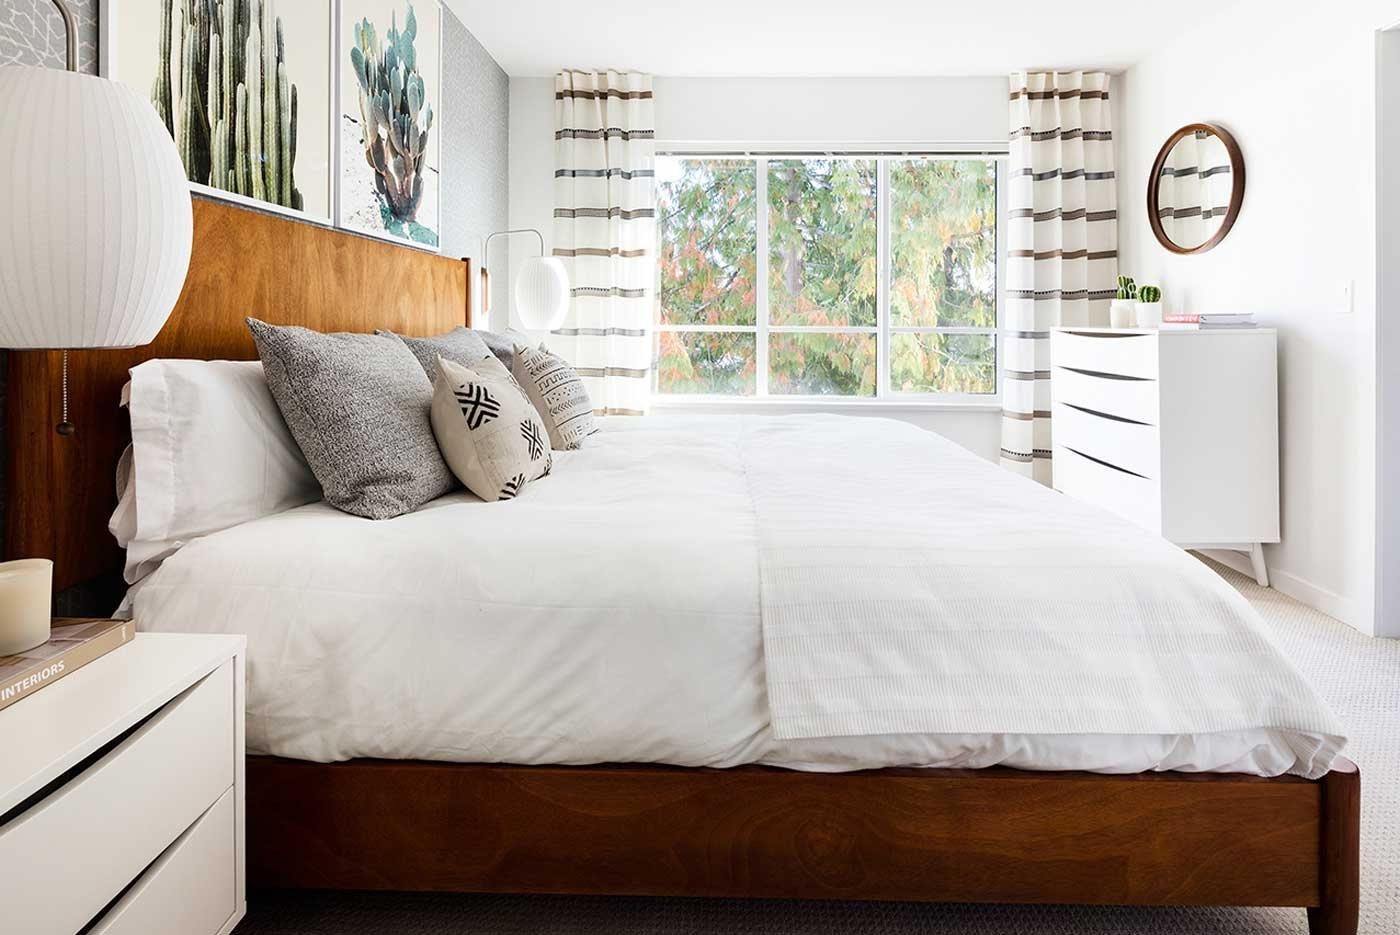 Bedroom - 18505 Laurensen Place, Surrey, BC V4N 6R7, Canada!